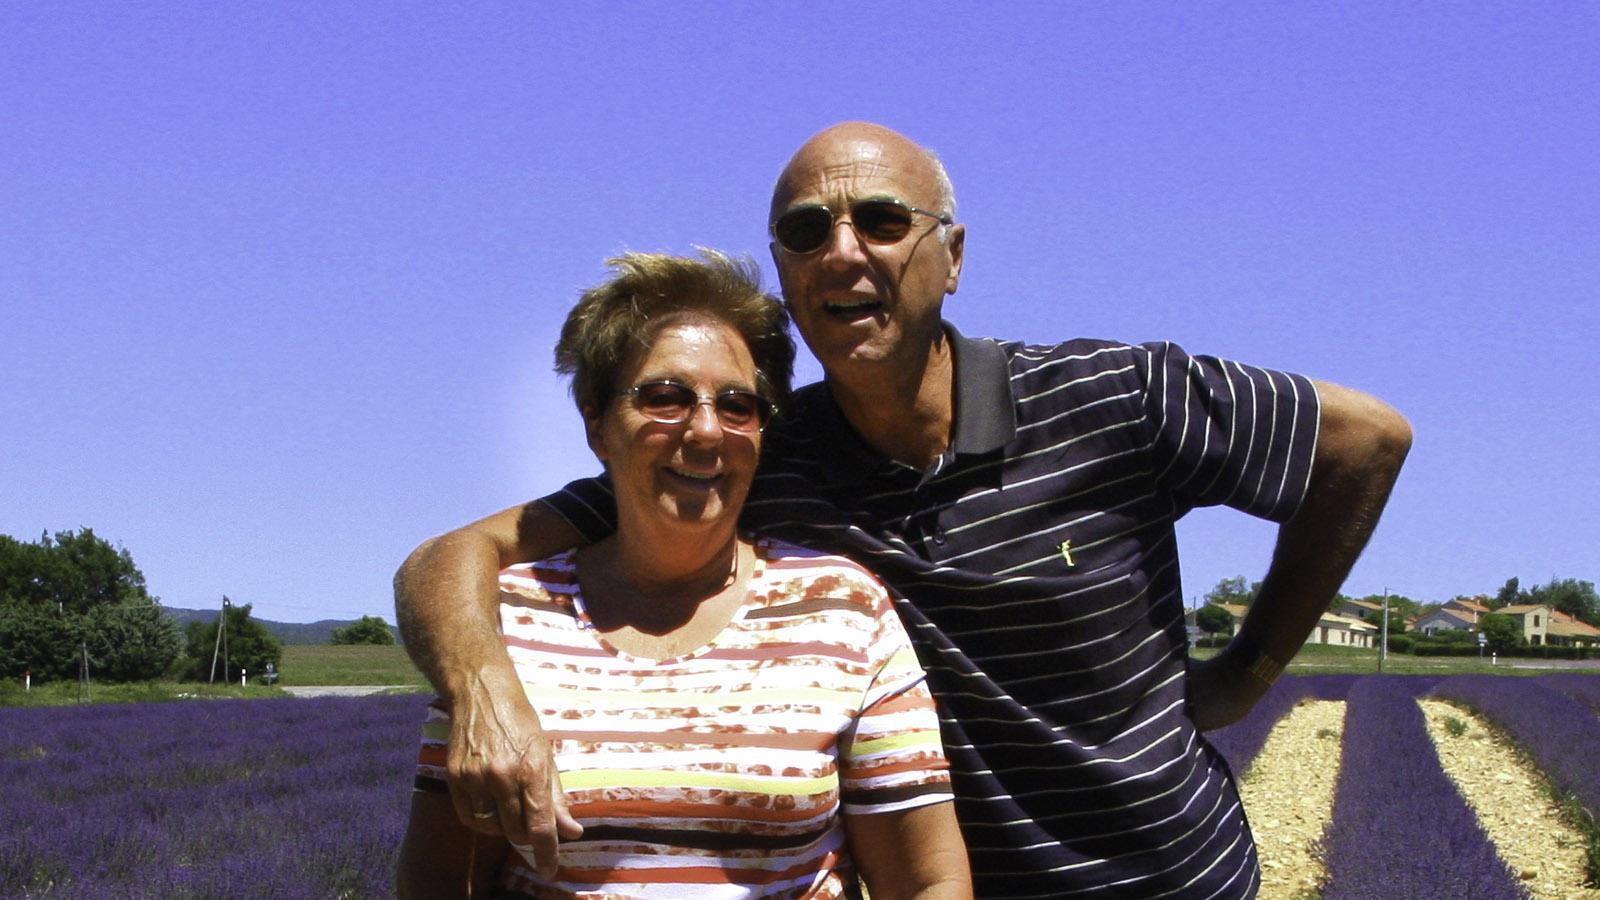 Karl-Heinz Stabel mit seiner Frau. Foto: Karl-Heinz Stabel